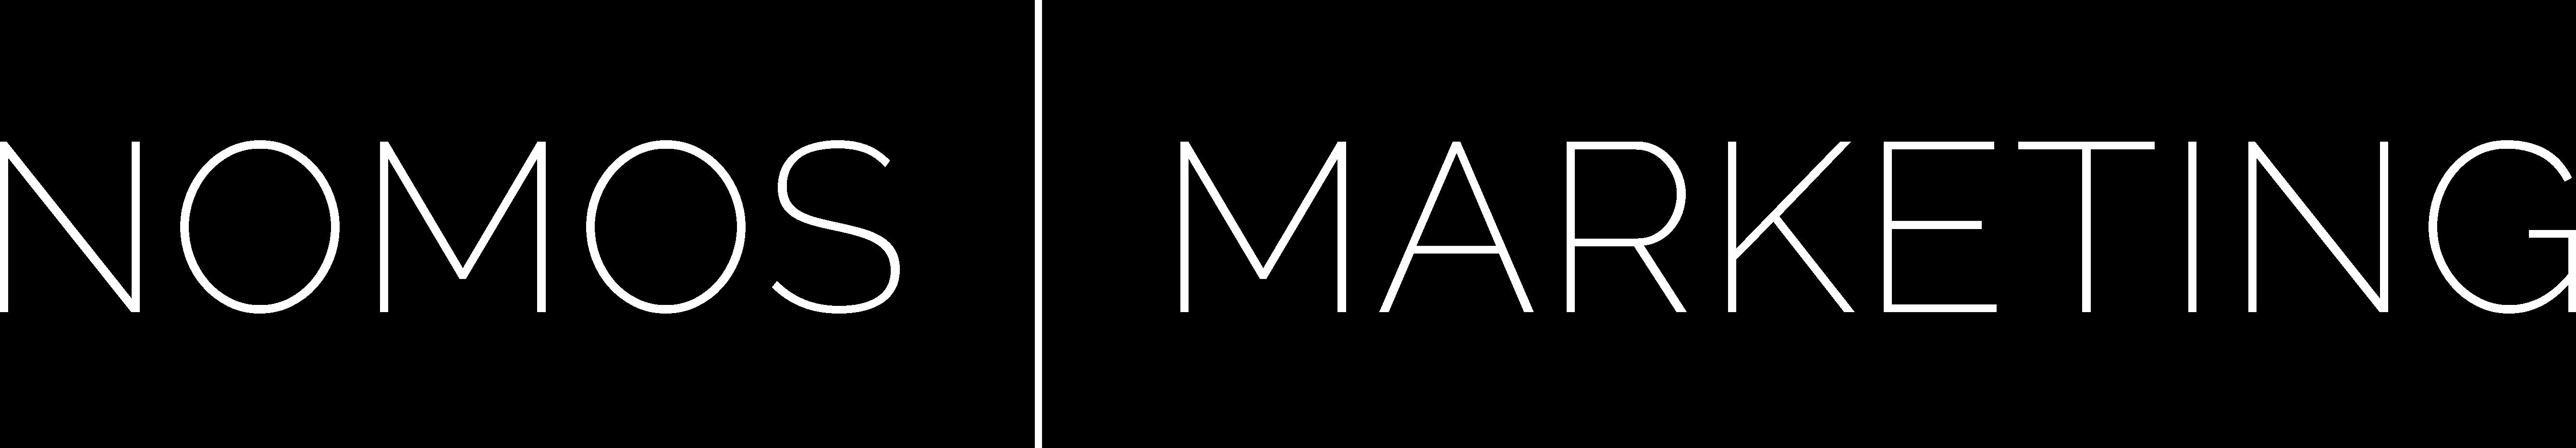 Nomos Marketing Logo